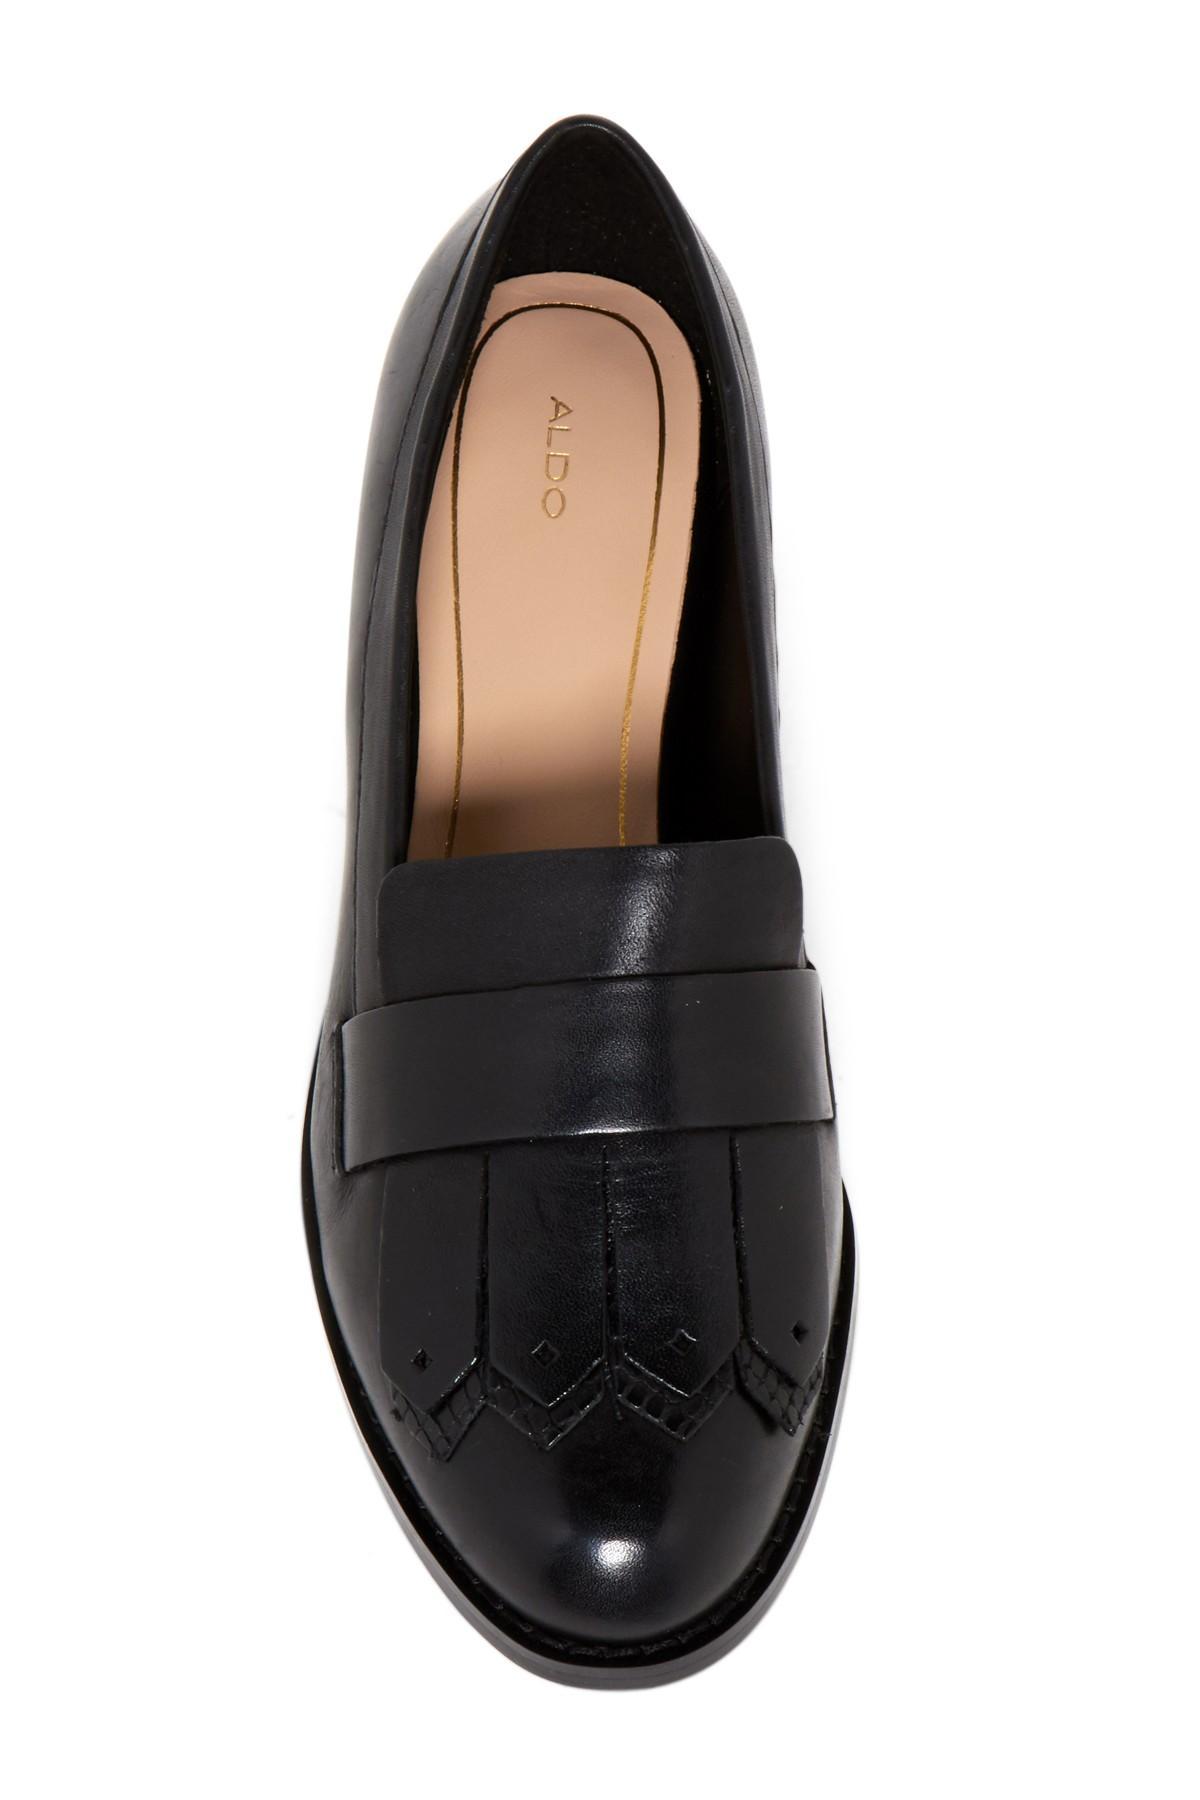 c1aaf0fefb1 Lyst - ALDO Mairi Loafer in Black